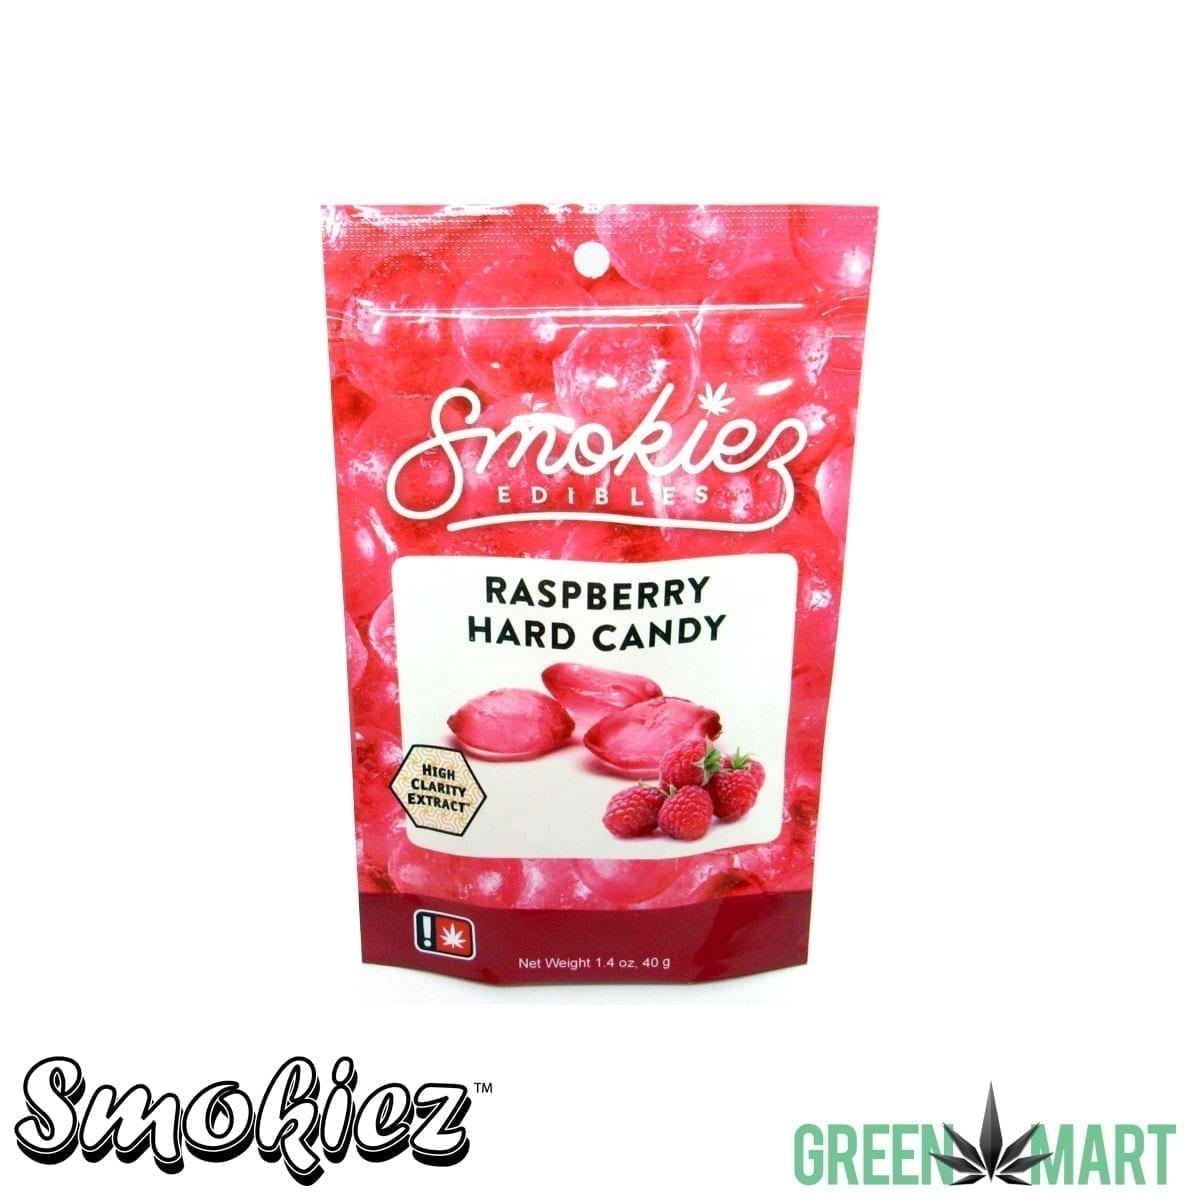 Smokiez Edibles - Raspberry Hard Candy